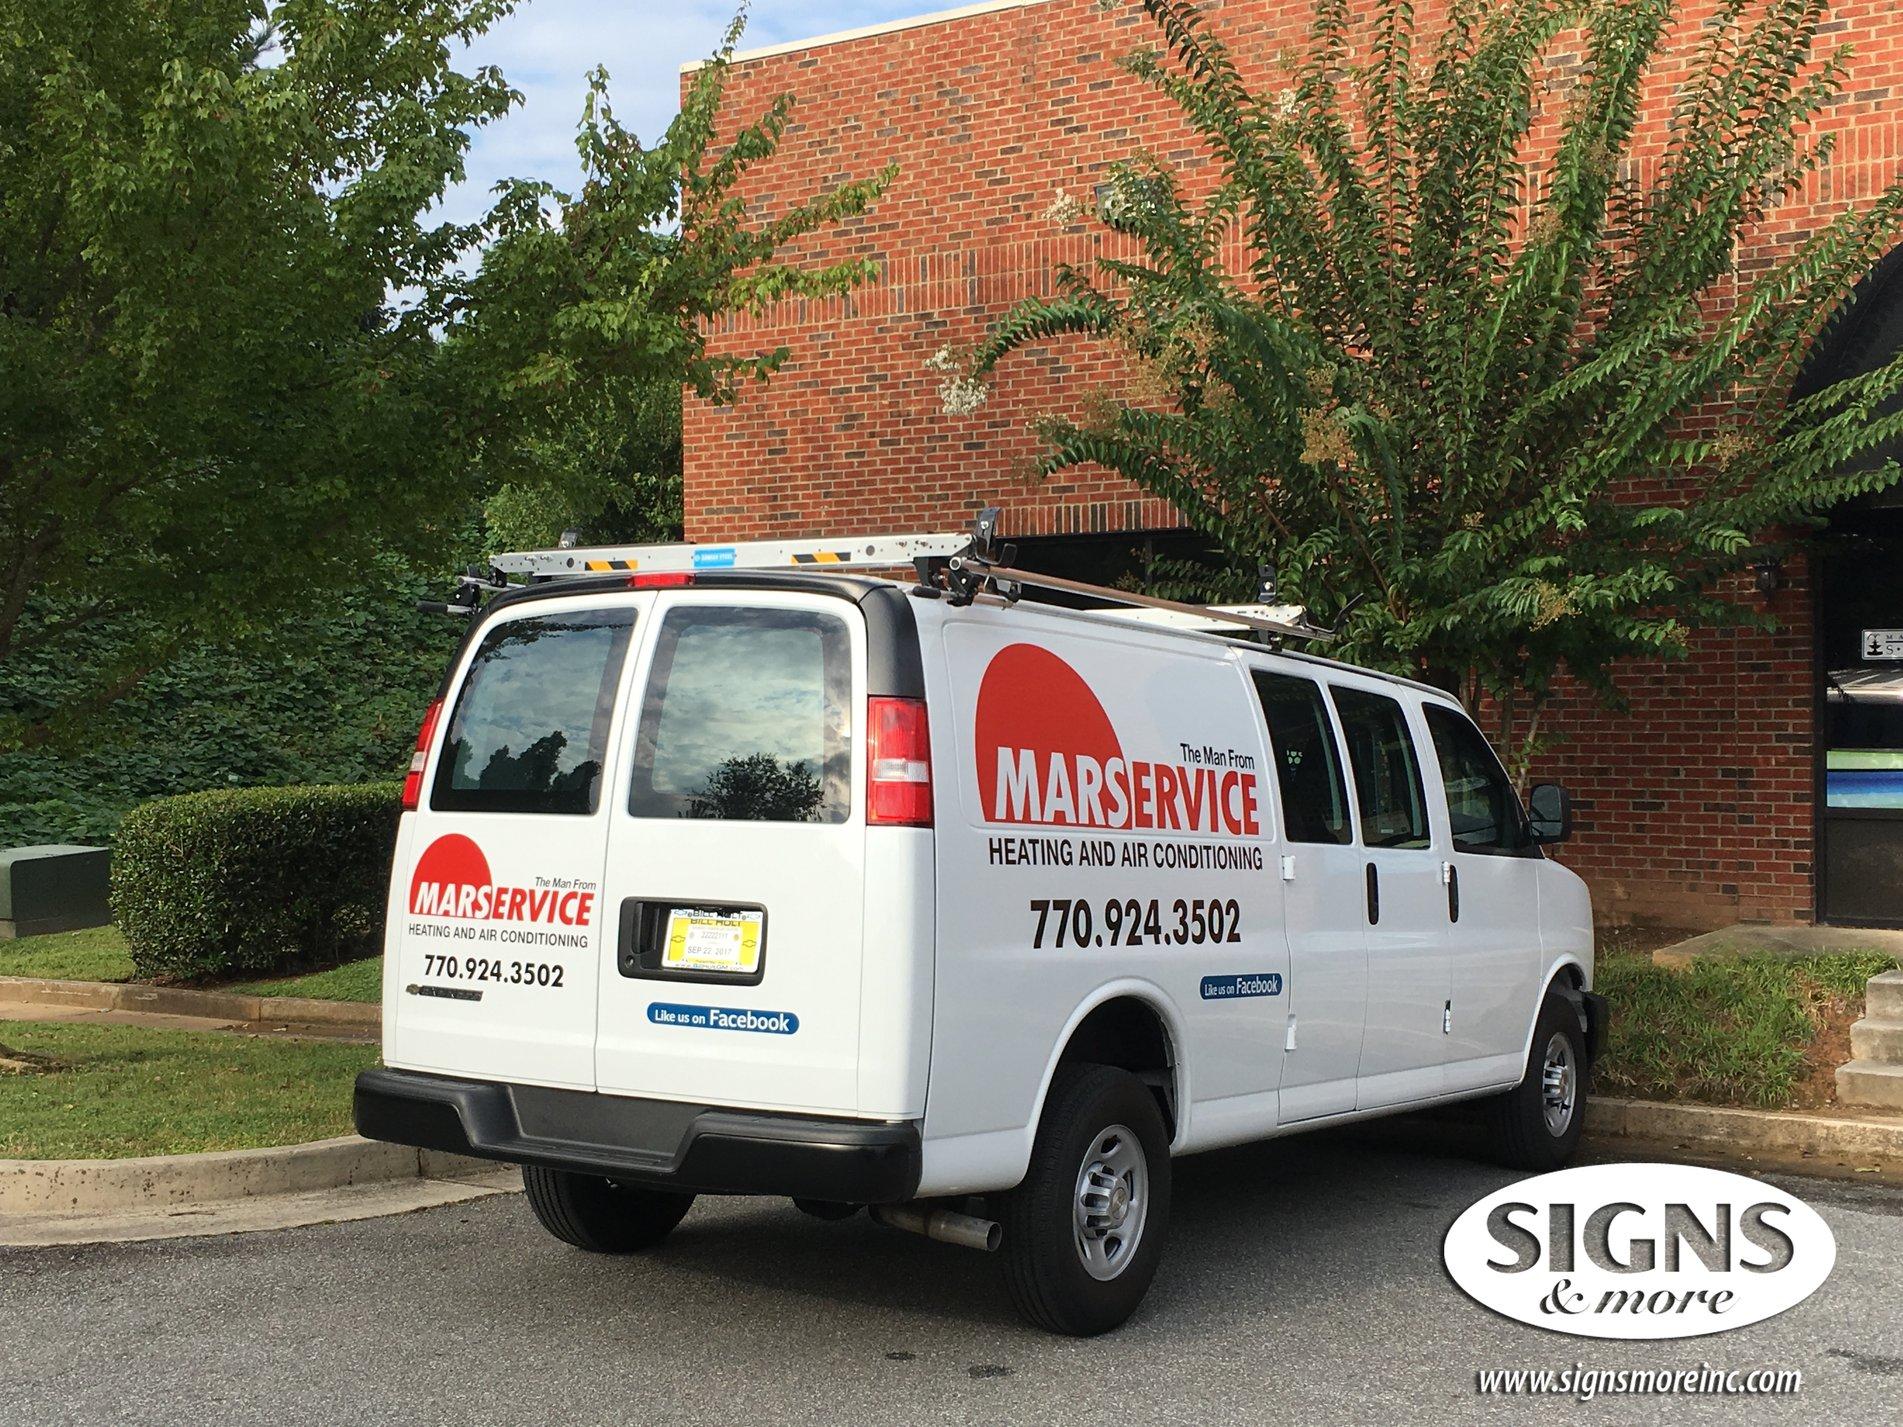 Honda Rome Ga >> Vehicle Wrap Gallery by Signs & More, Inc - Cartersville, Marietta, GA